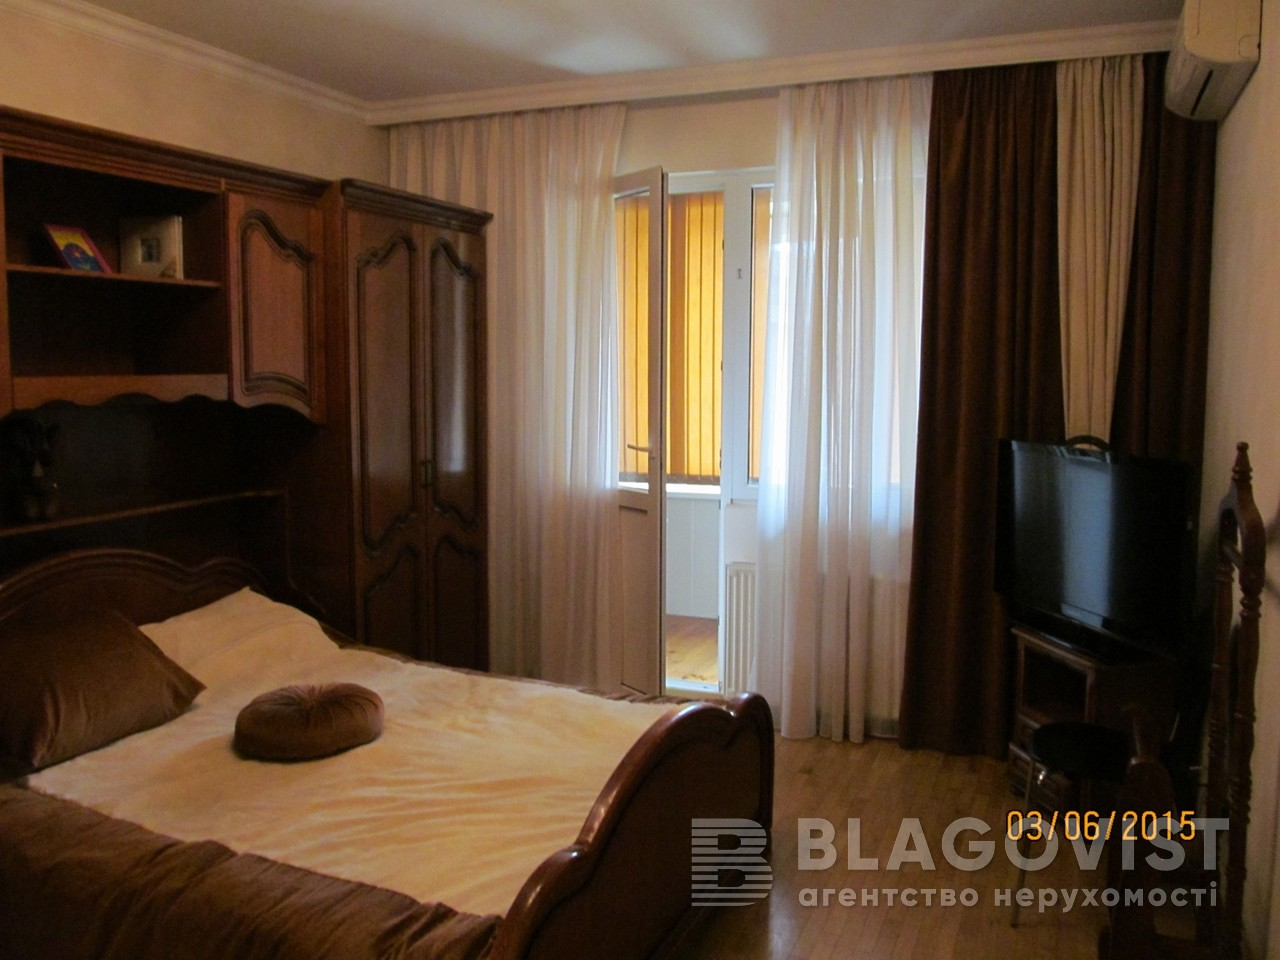 Квартира C-101503, Мельникова, 83д, Киев - Фото 5